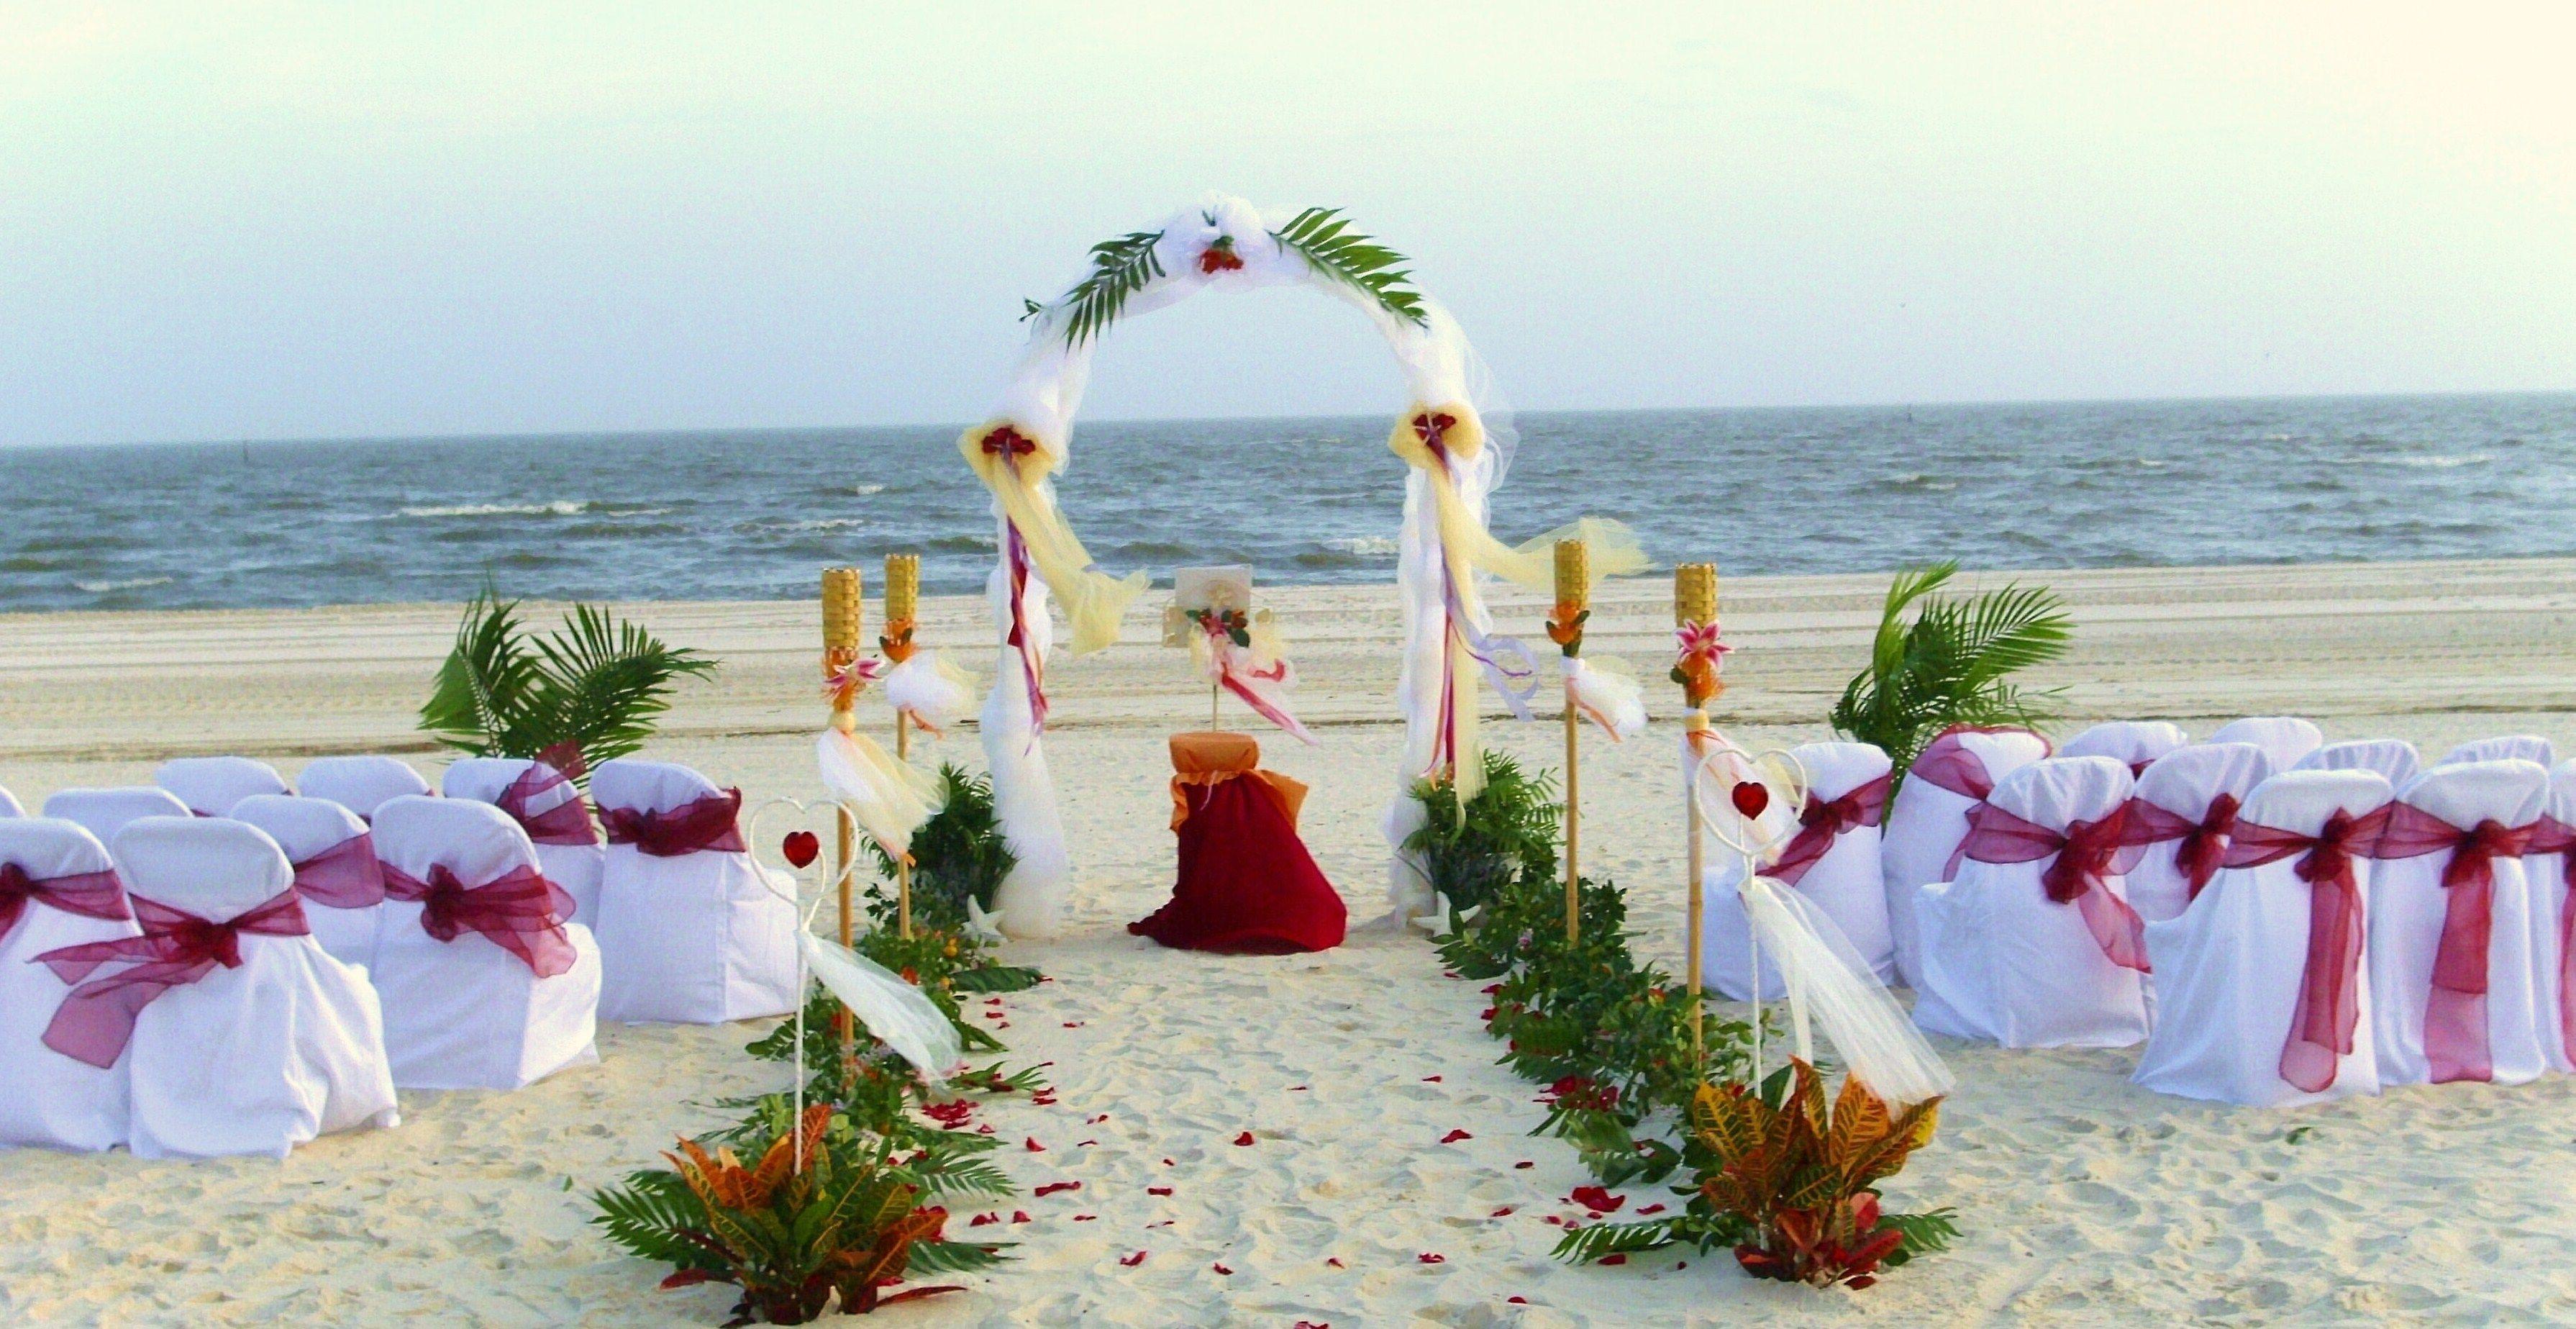 Wedding on the beach - Beach Wedding Signs